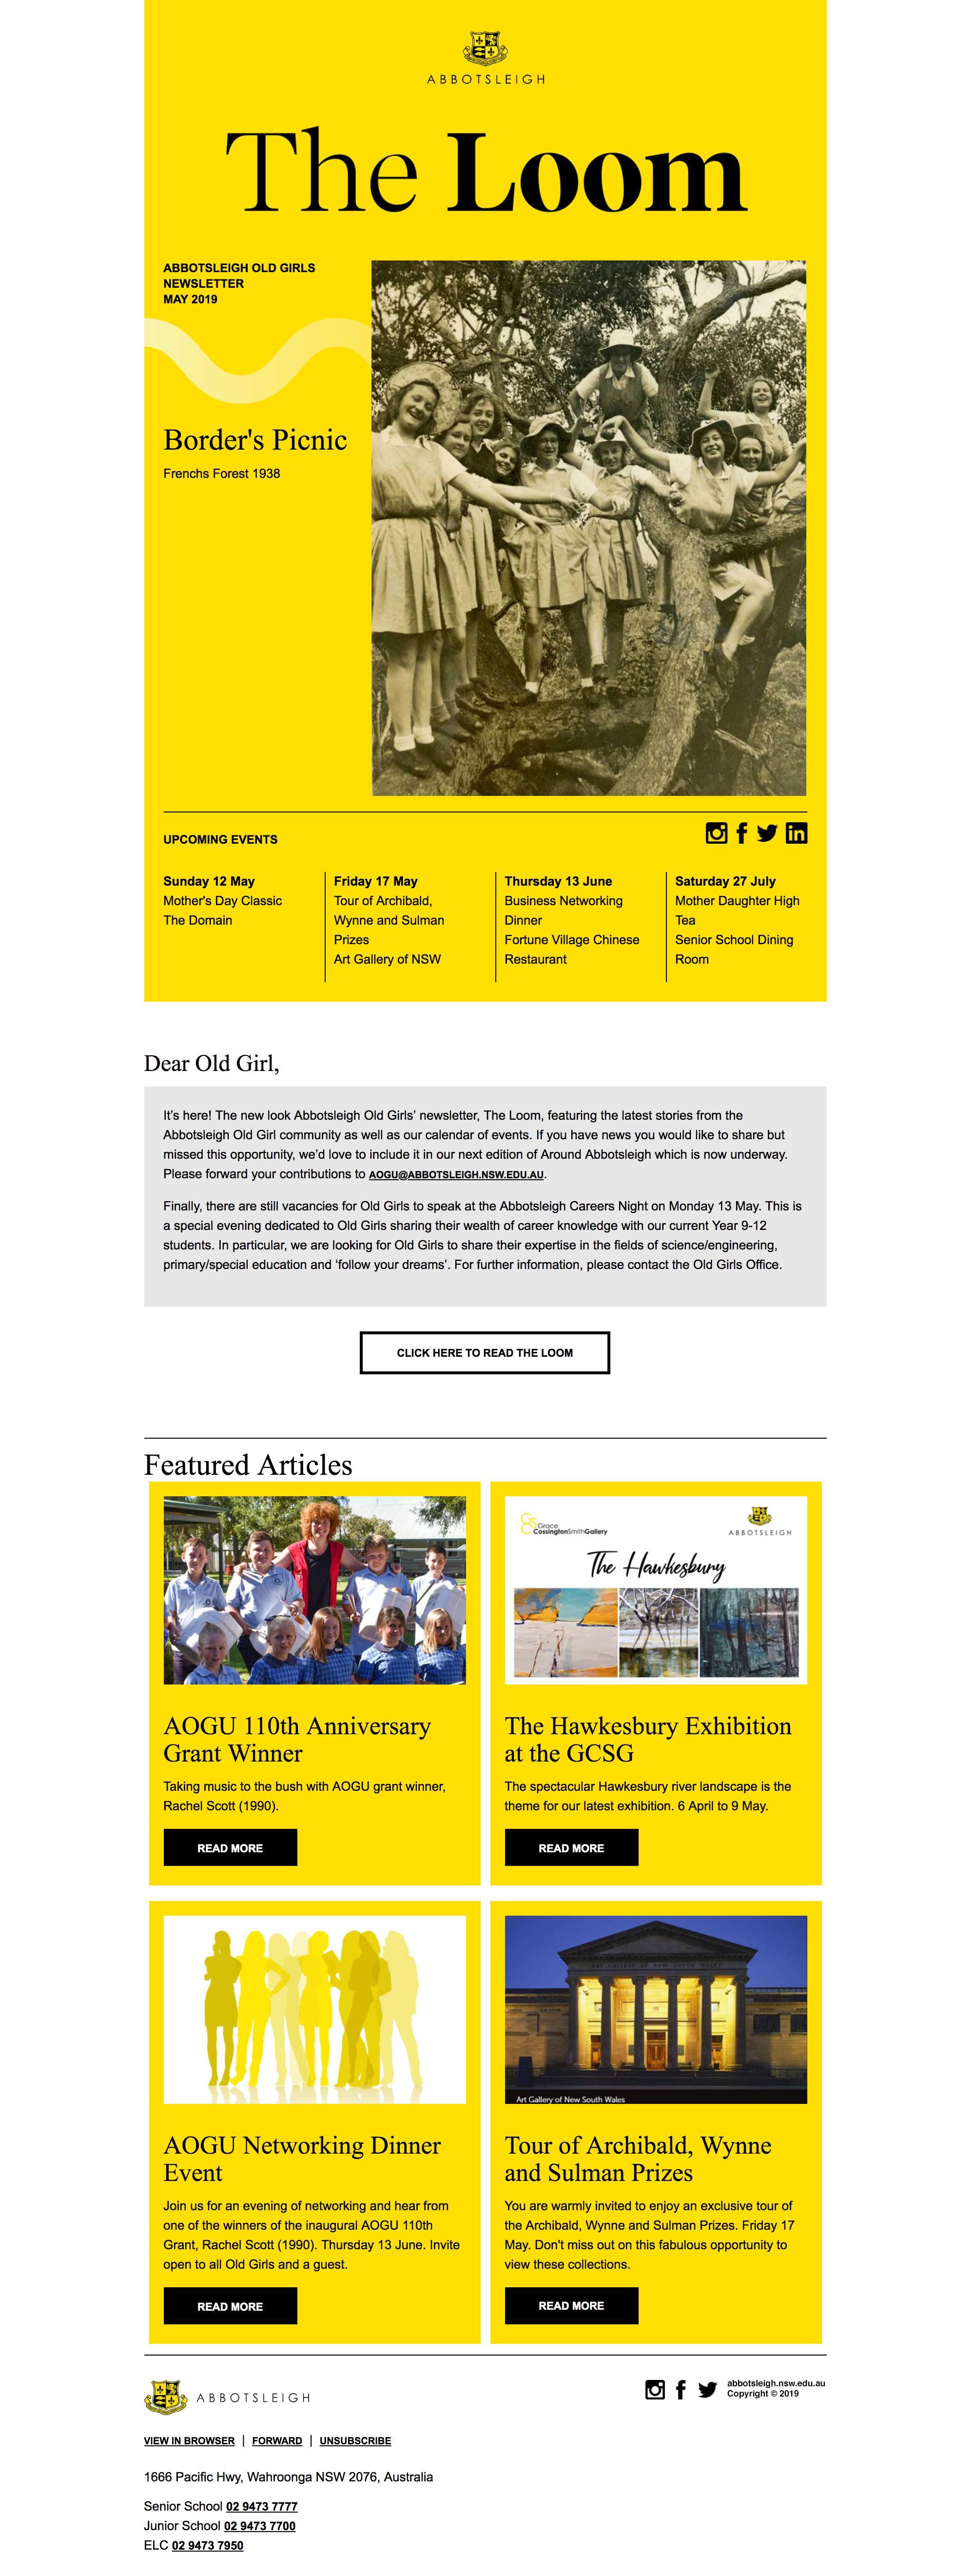 AOGU Newsletter, The Loom May 2019 - desktop view